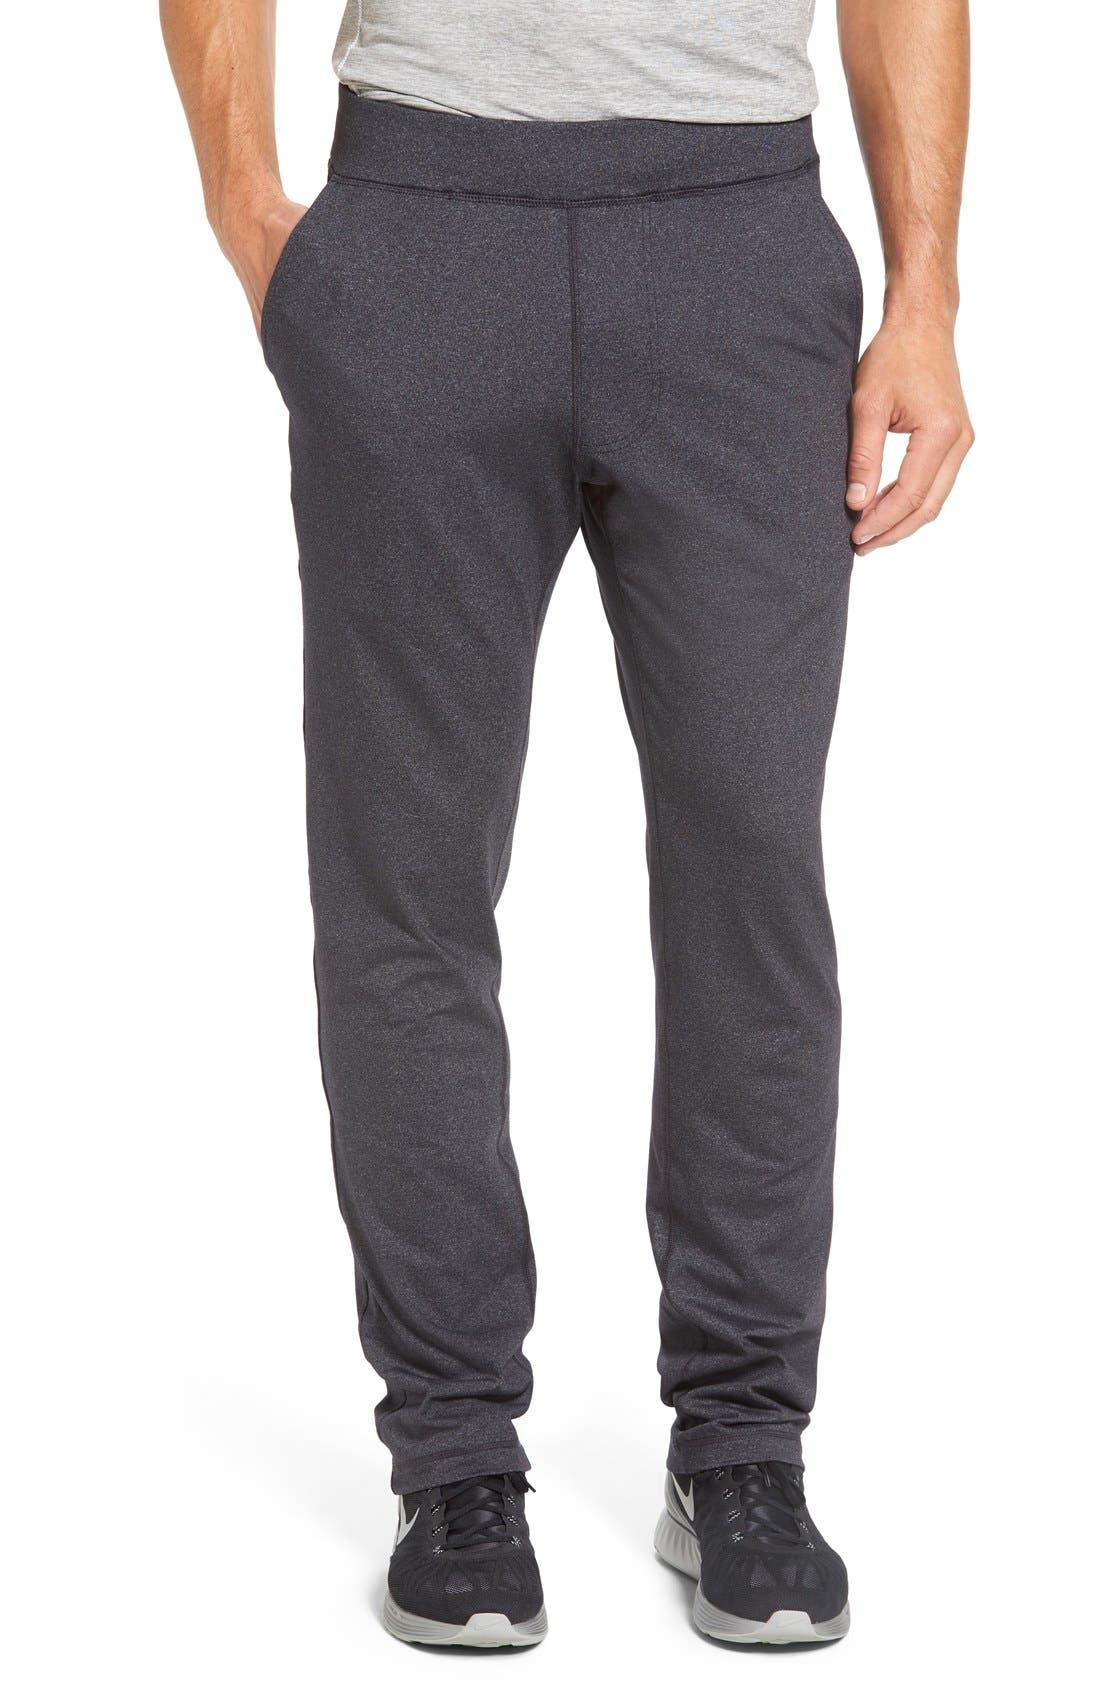 Sodo 206 Pants, Grey